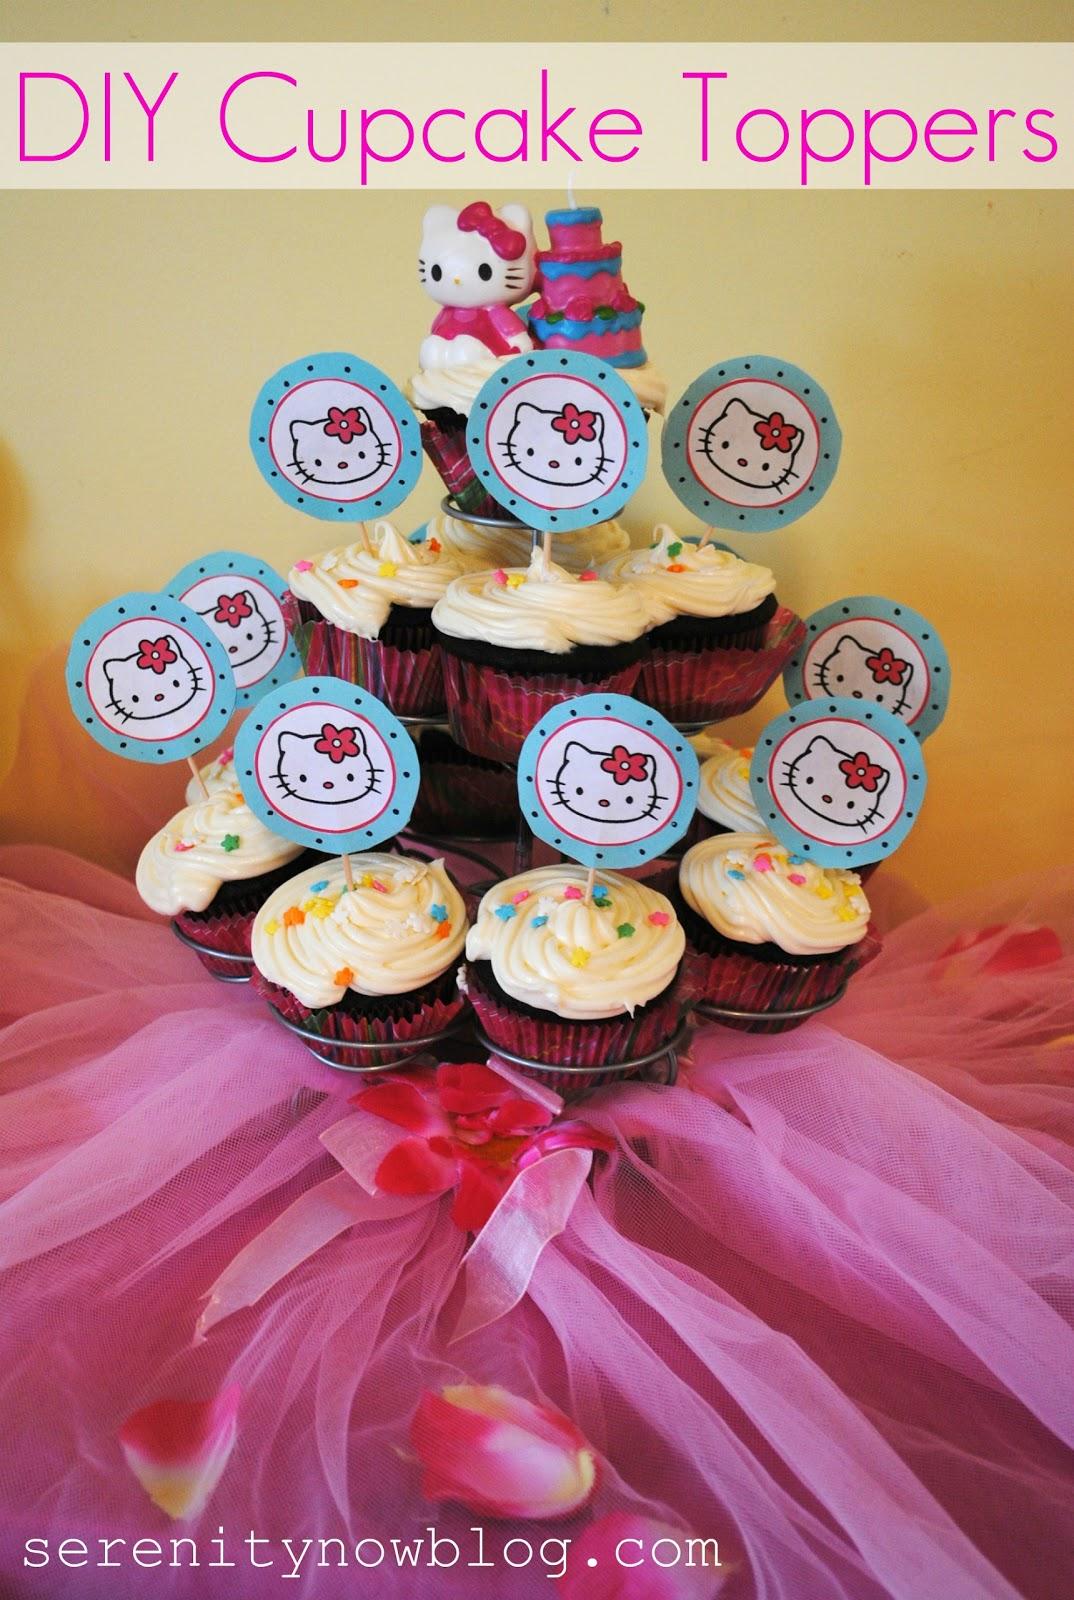 DIY Cupcake Toppers Craft Tutorial